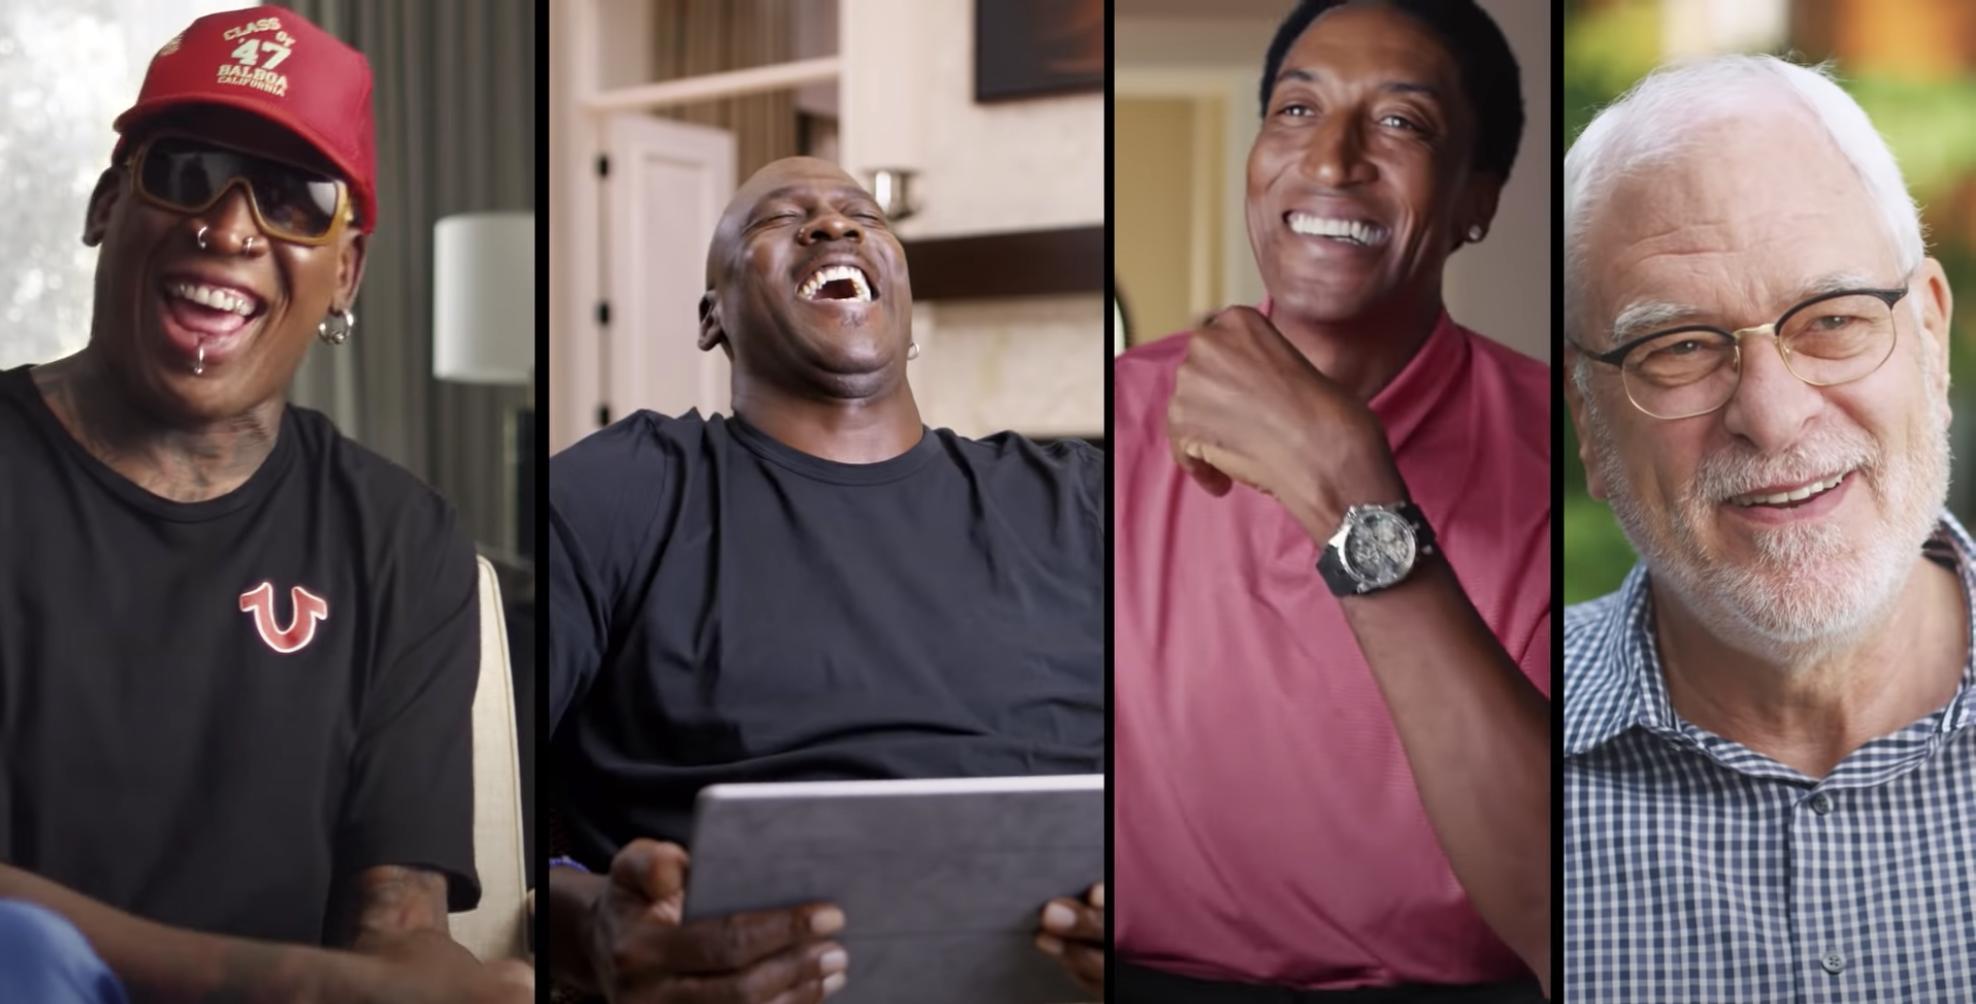 Dennis Rodman, Michael Jordan, Scotty Pippen, and Phil Jackson on The Last Dance